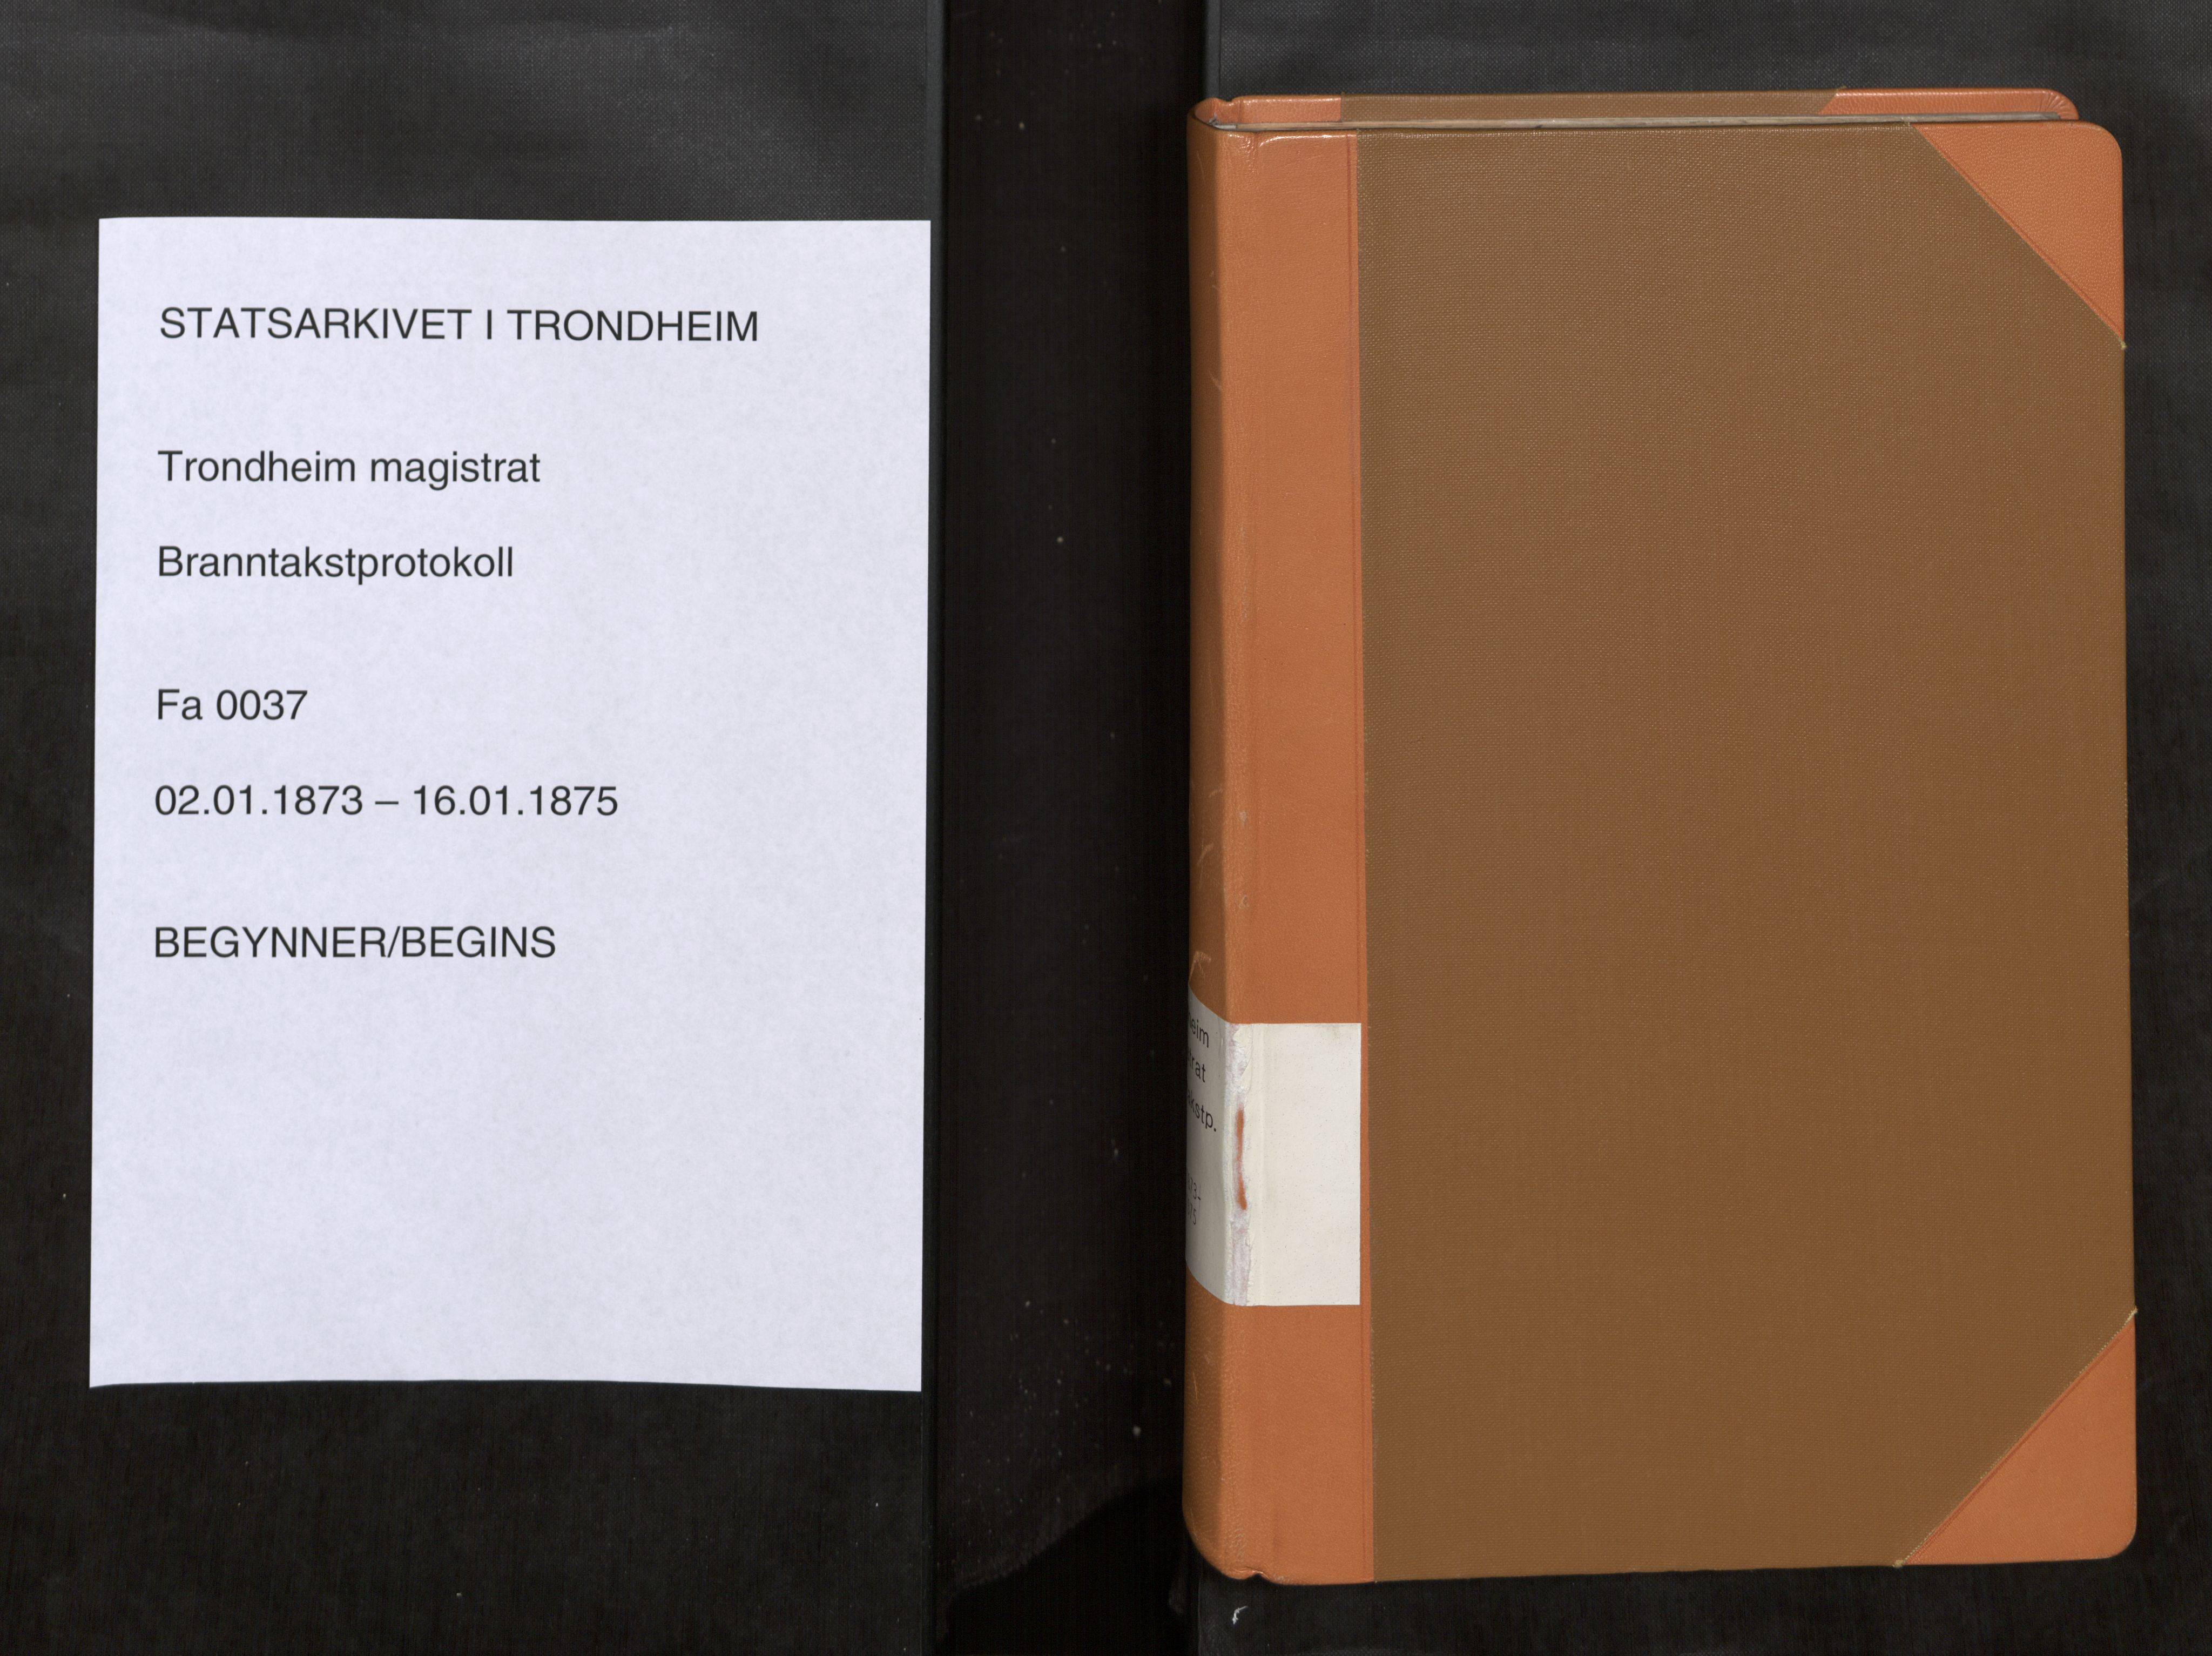 SAT, Norges Brannkasse Trondheim magistrat, Branntakstprotokoller med tekst, nr. 37: 1873-1875, 1873-1875